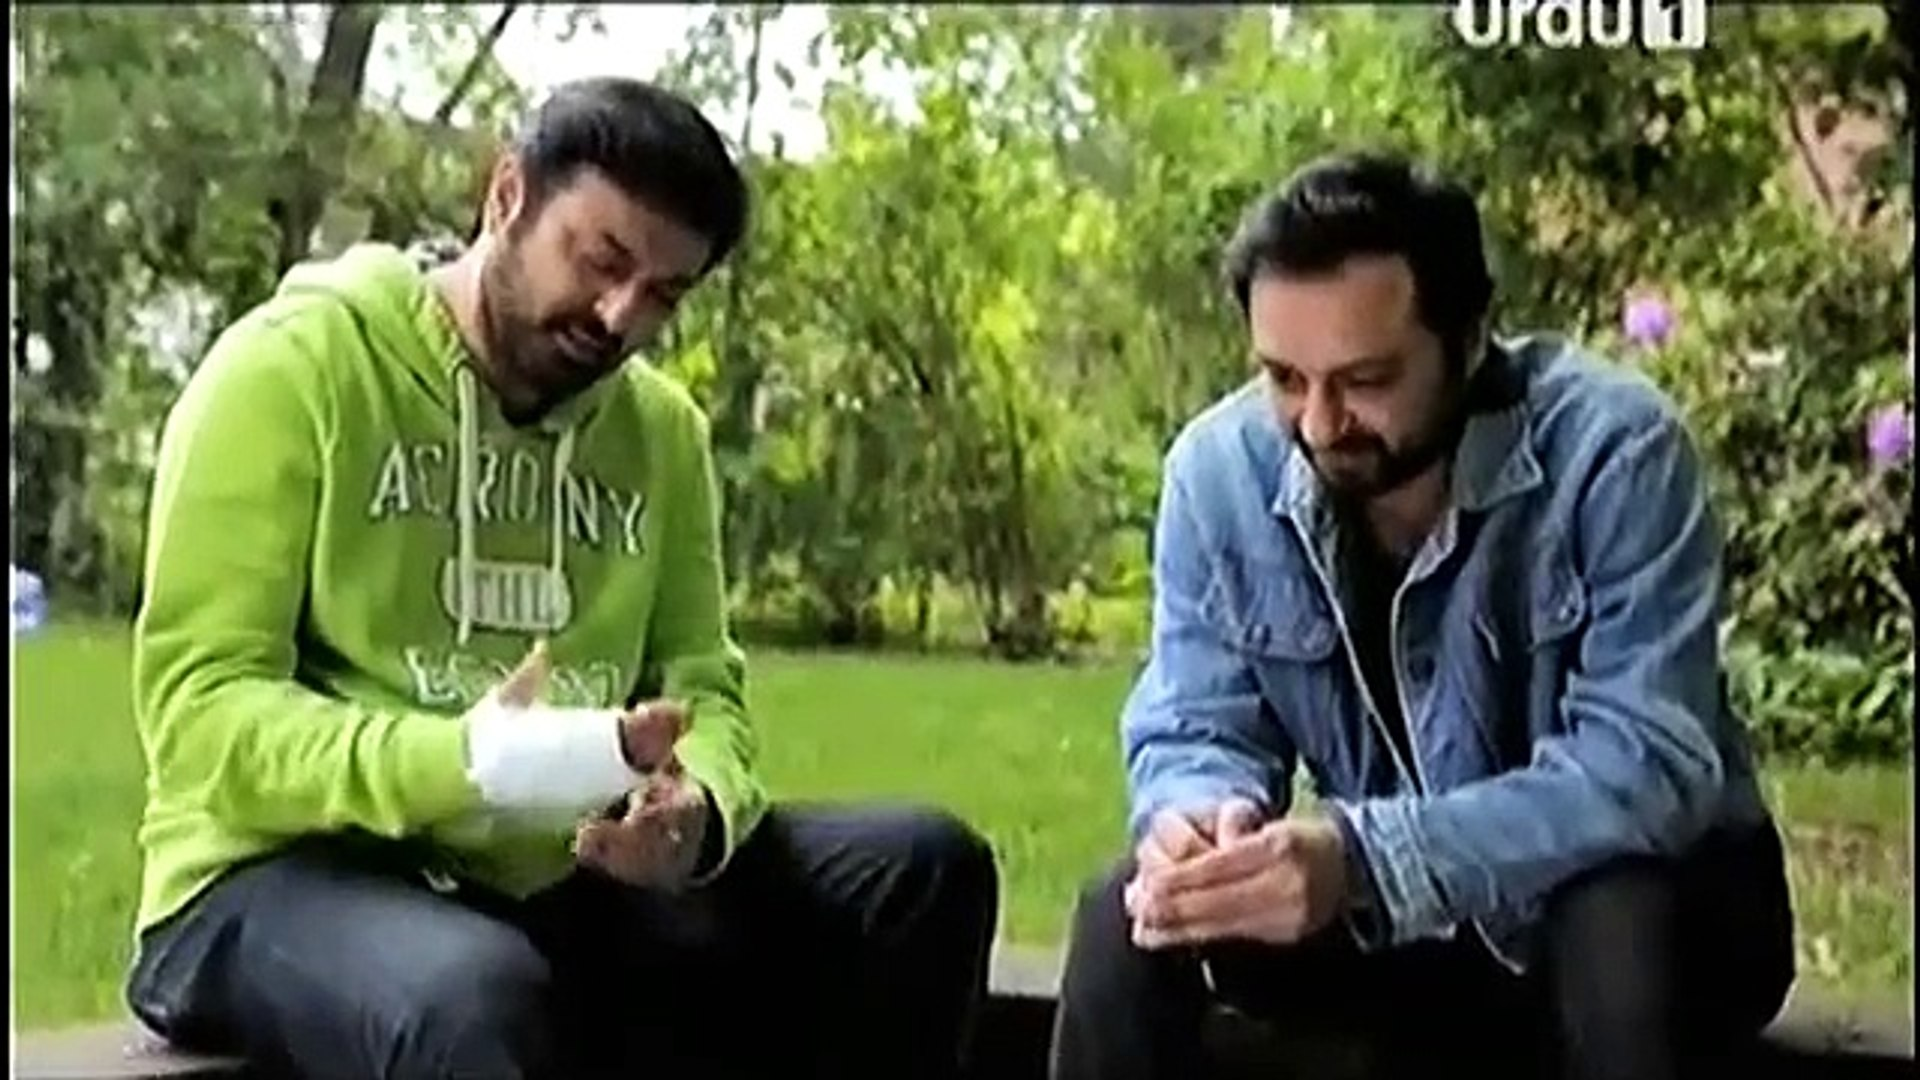 Jackson Heights Episode 15 By Urdu1 26 December 2014 New Full Episode